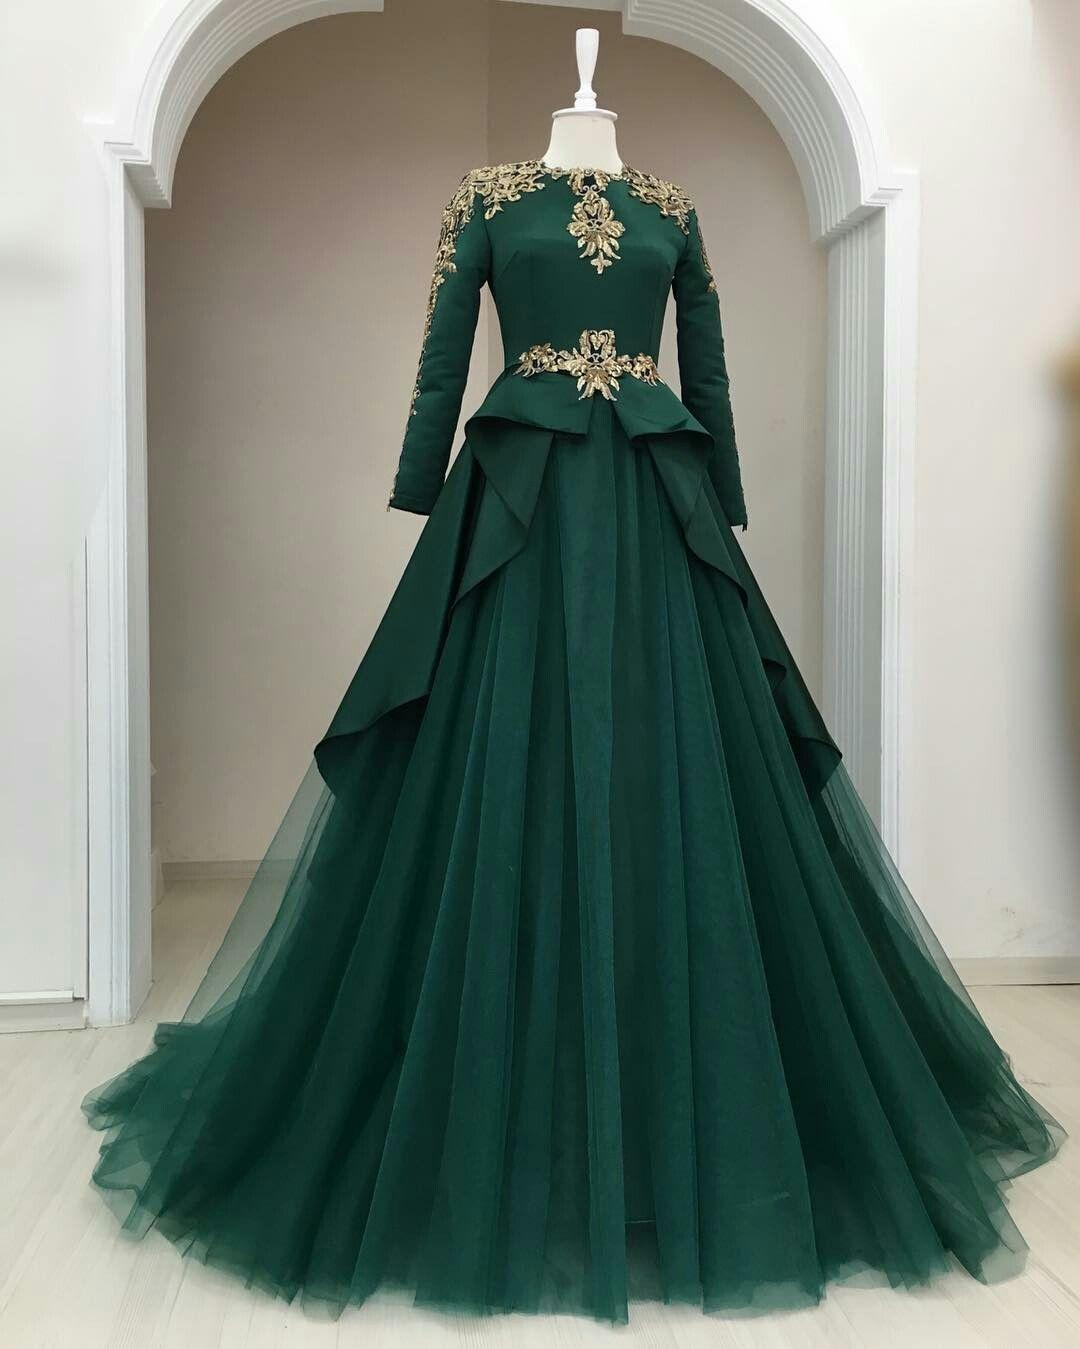 8a945c1e45520 Pin by Ruqayya Imran on Long sleeve dress